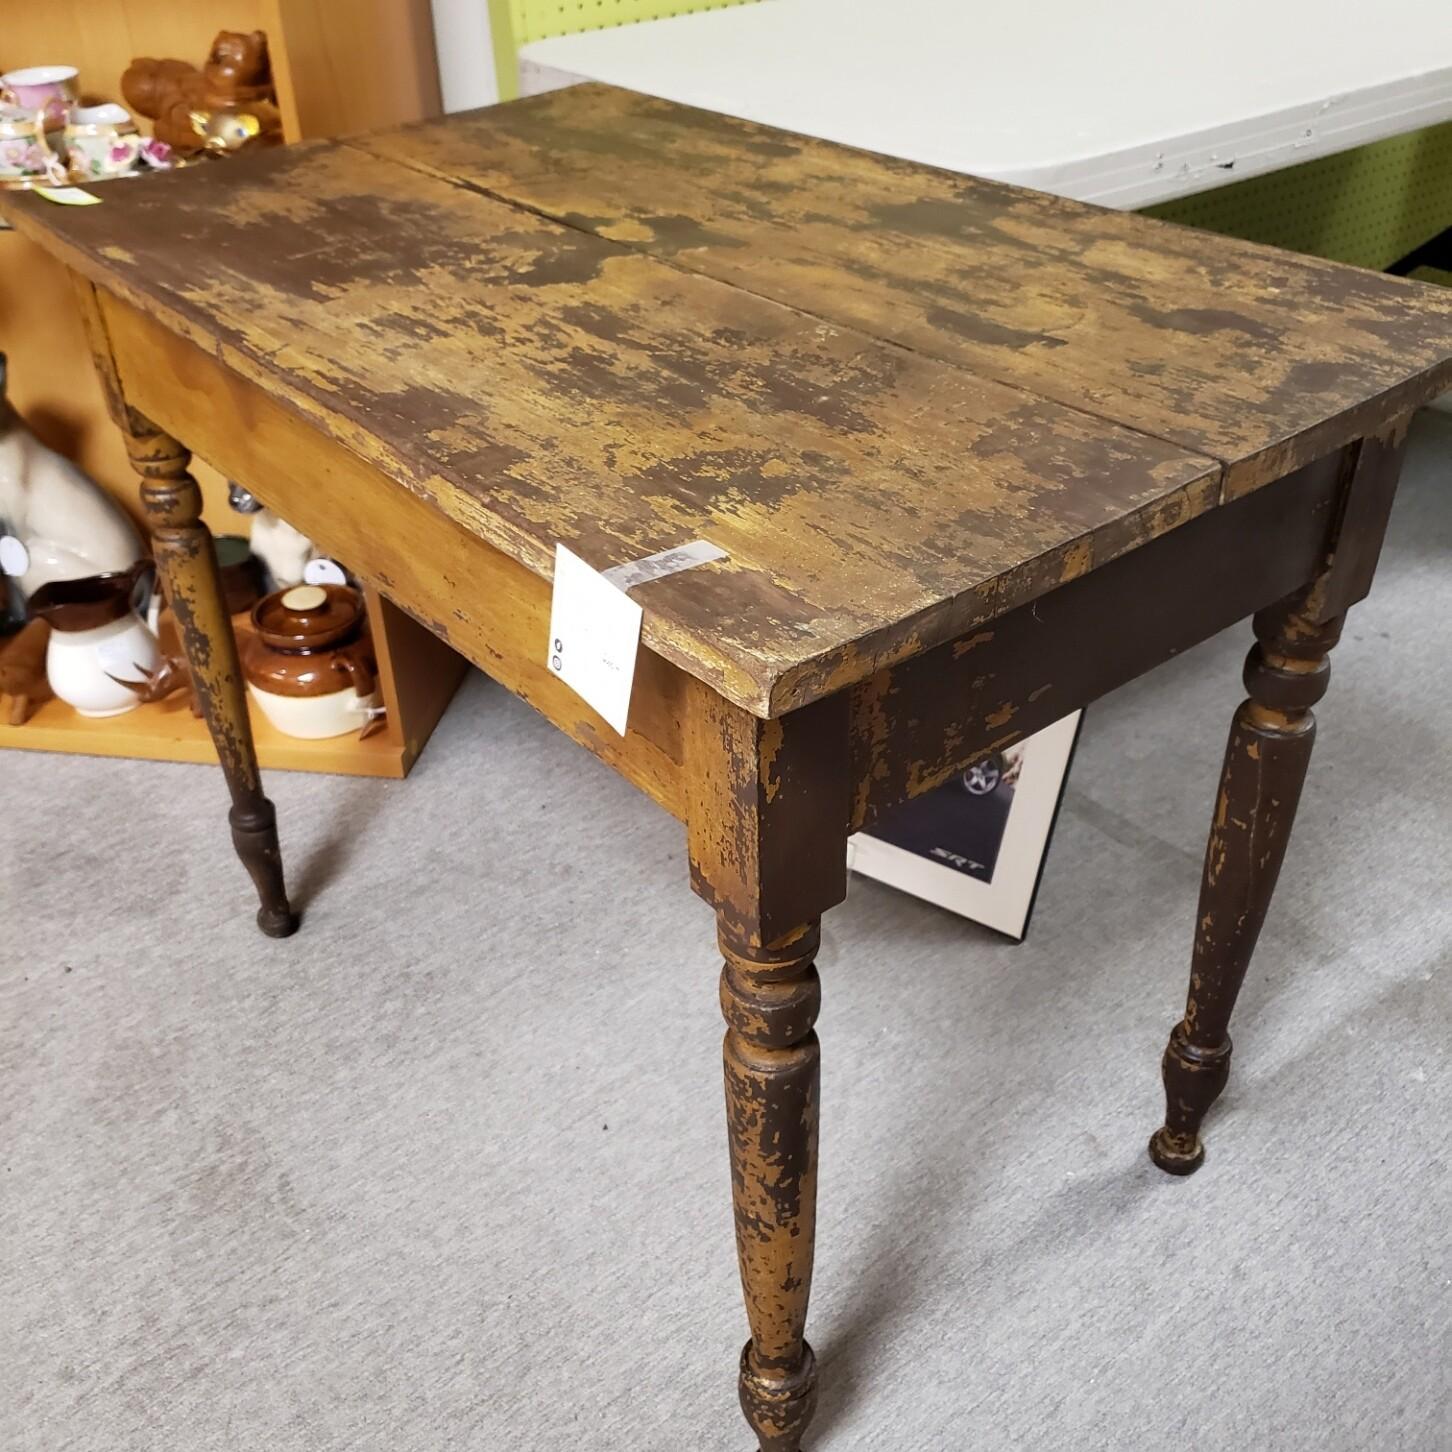 Rustic Work Table - B73